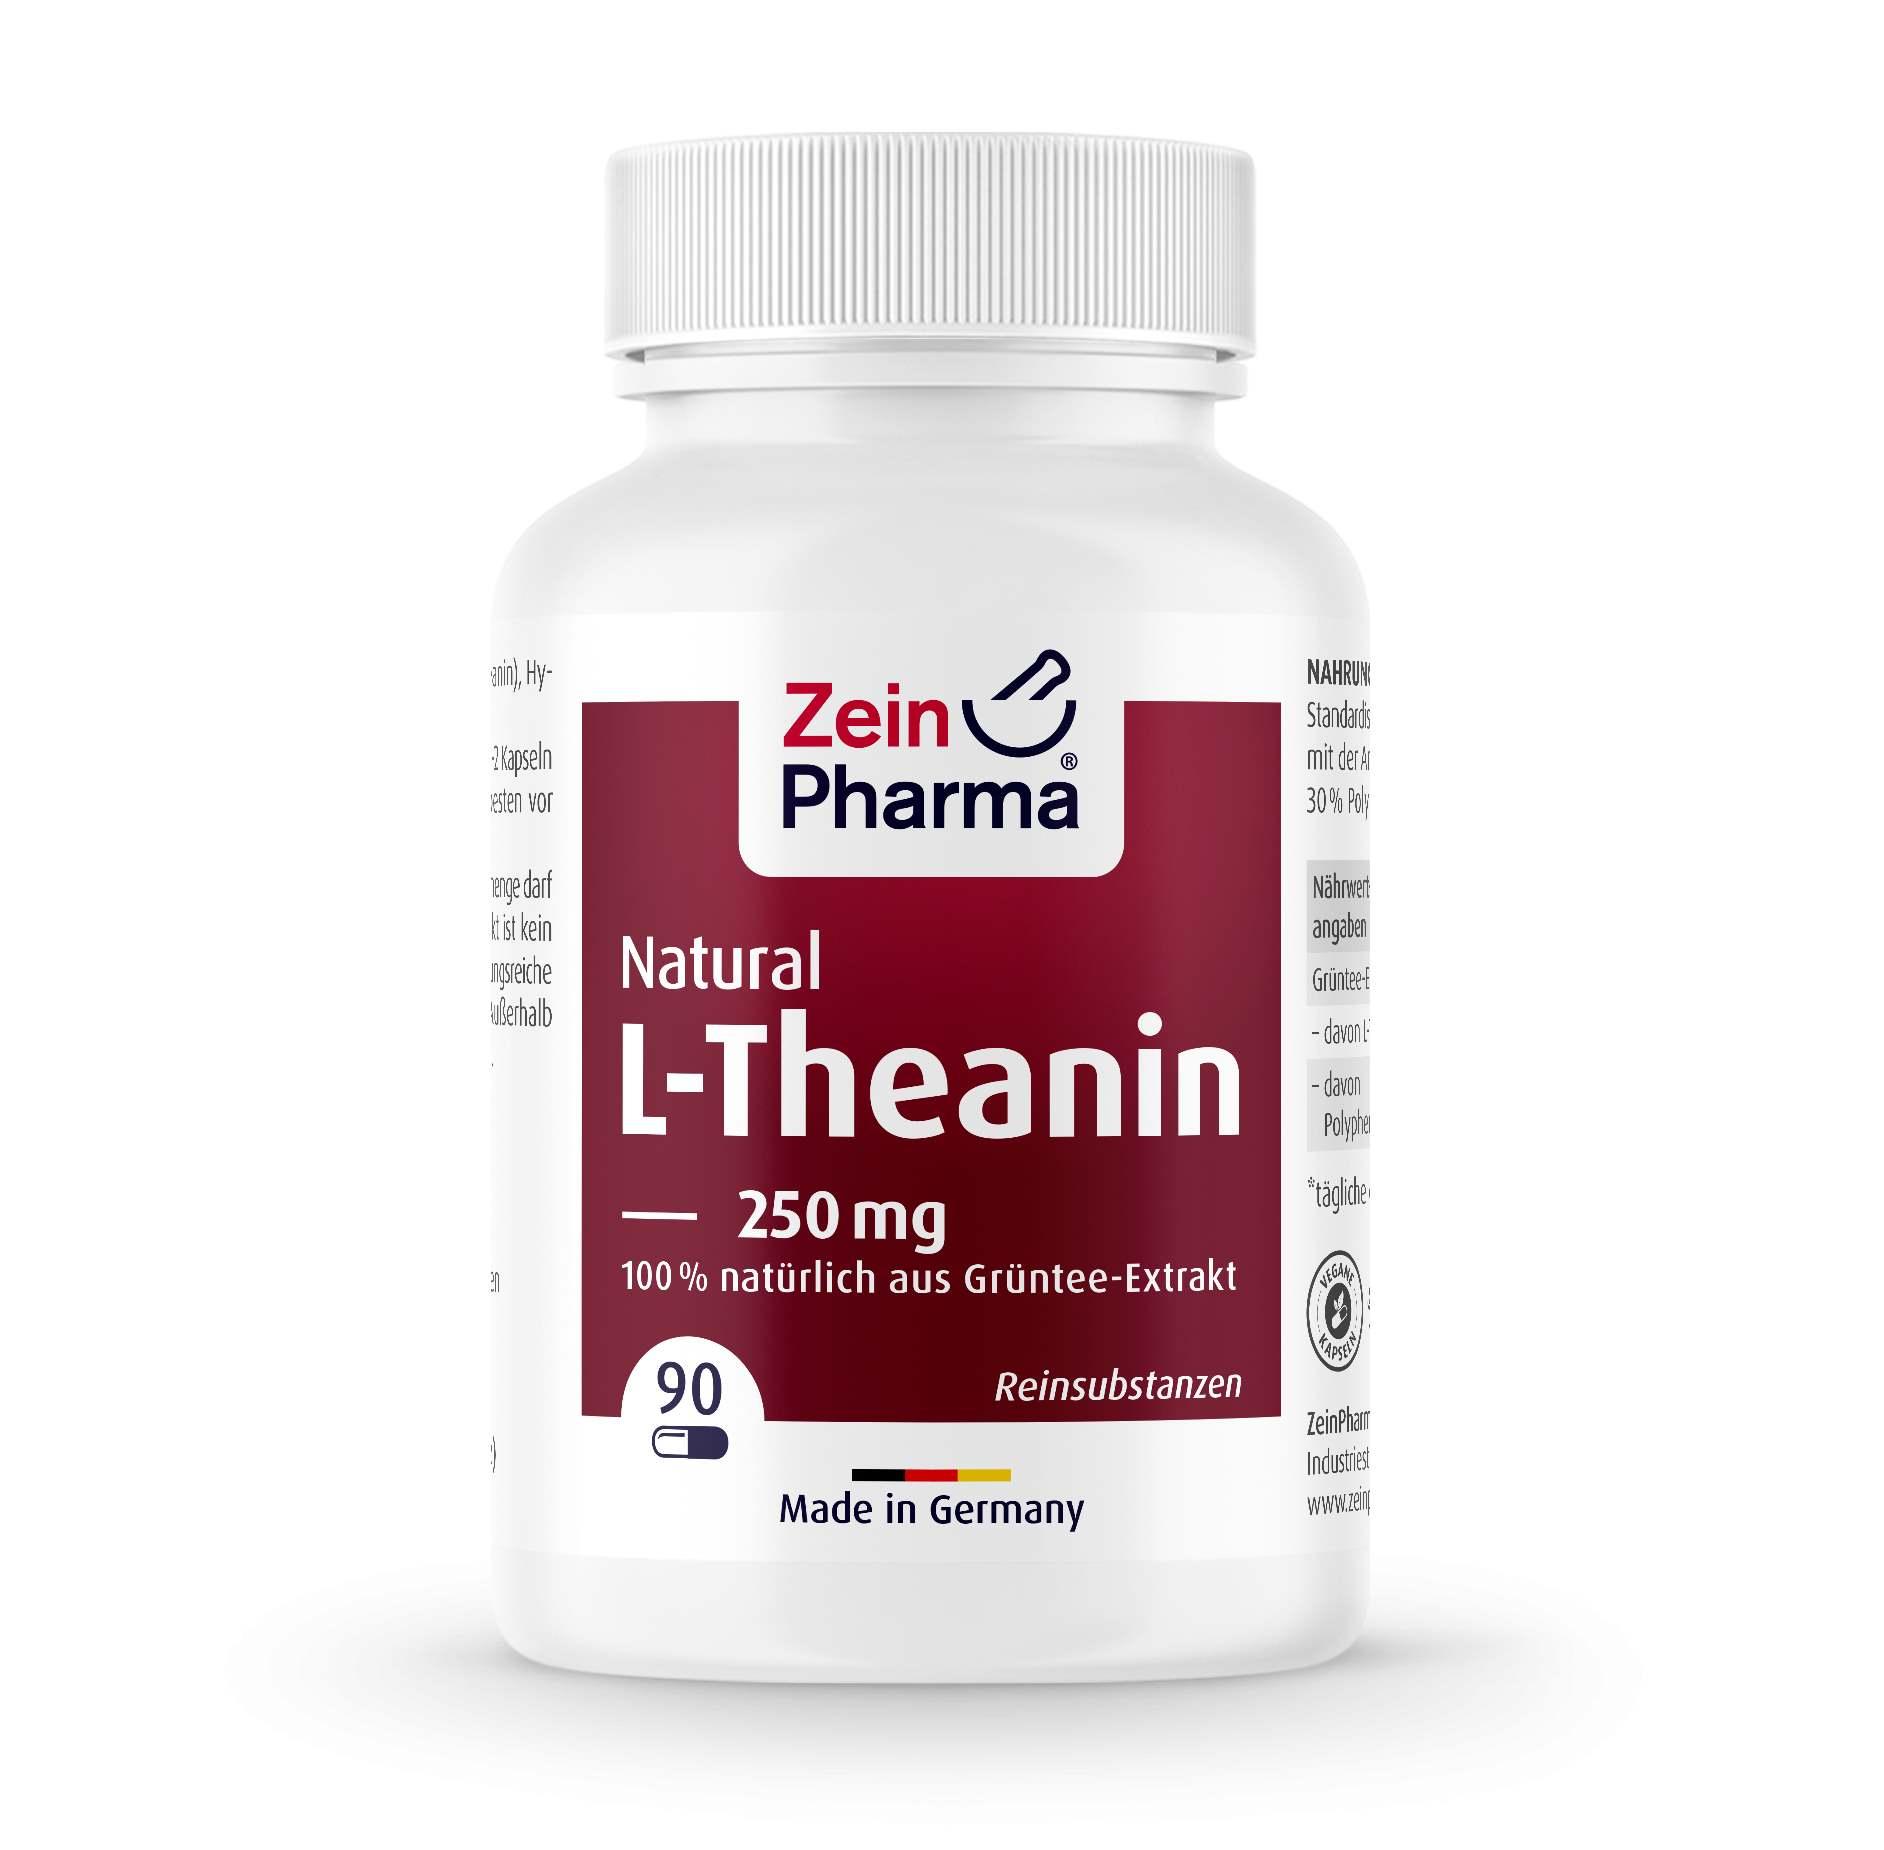 L-Theanin Natural 250 mg - 90 Kapseln